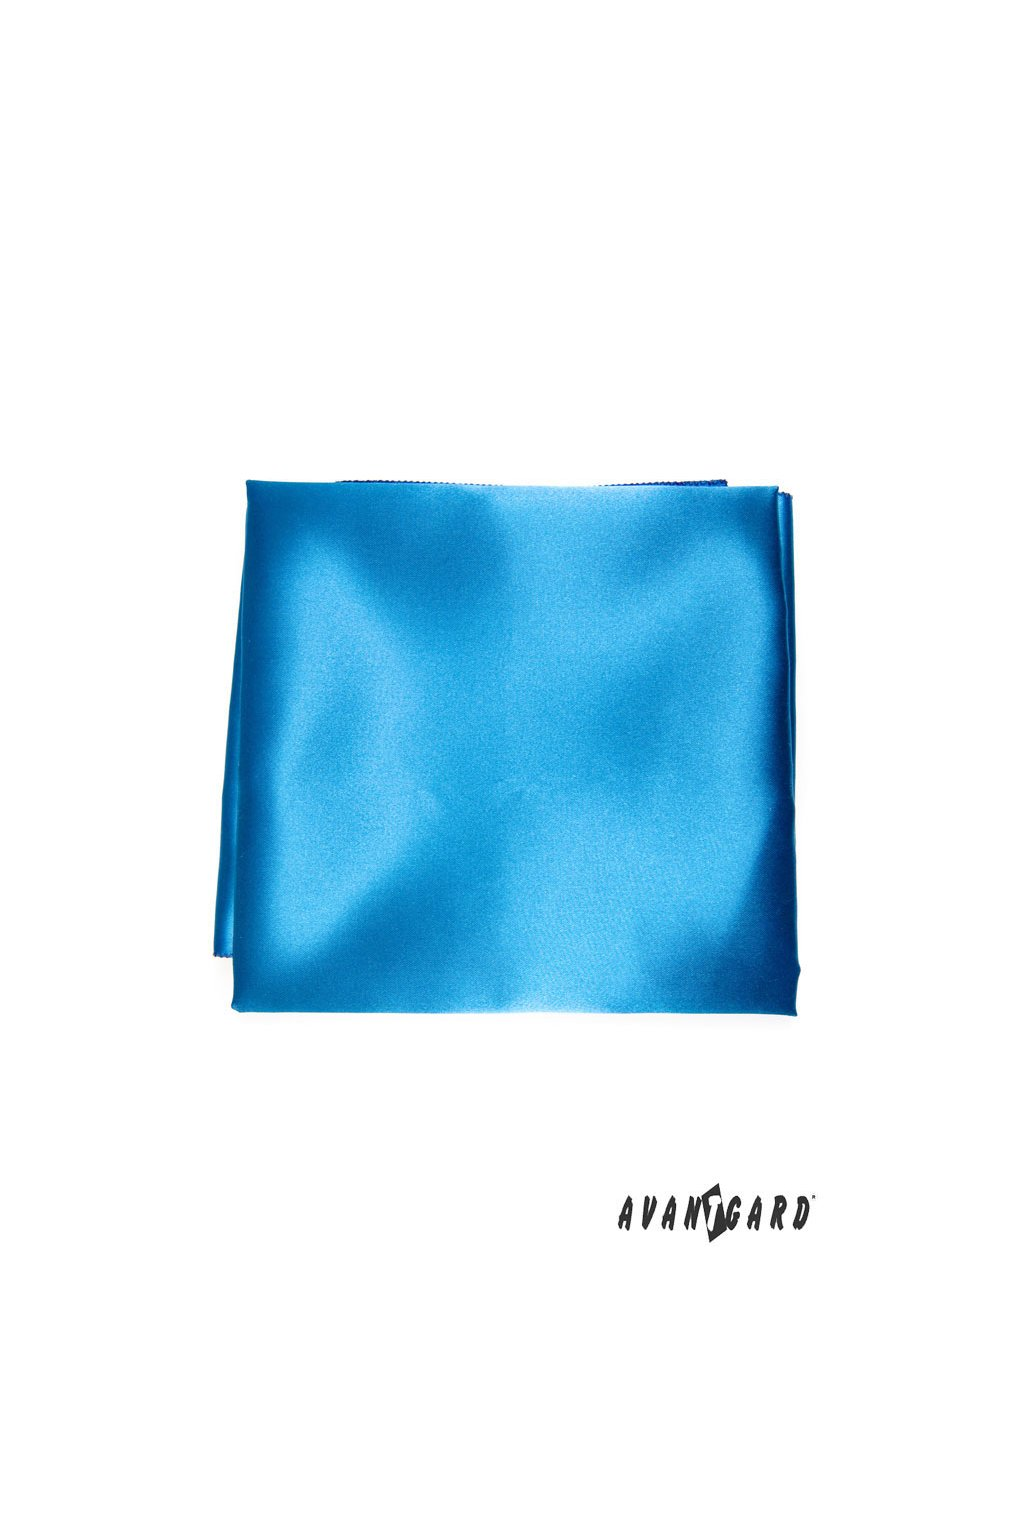 Šátek 50x50 modrá 882 - 9013